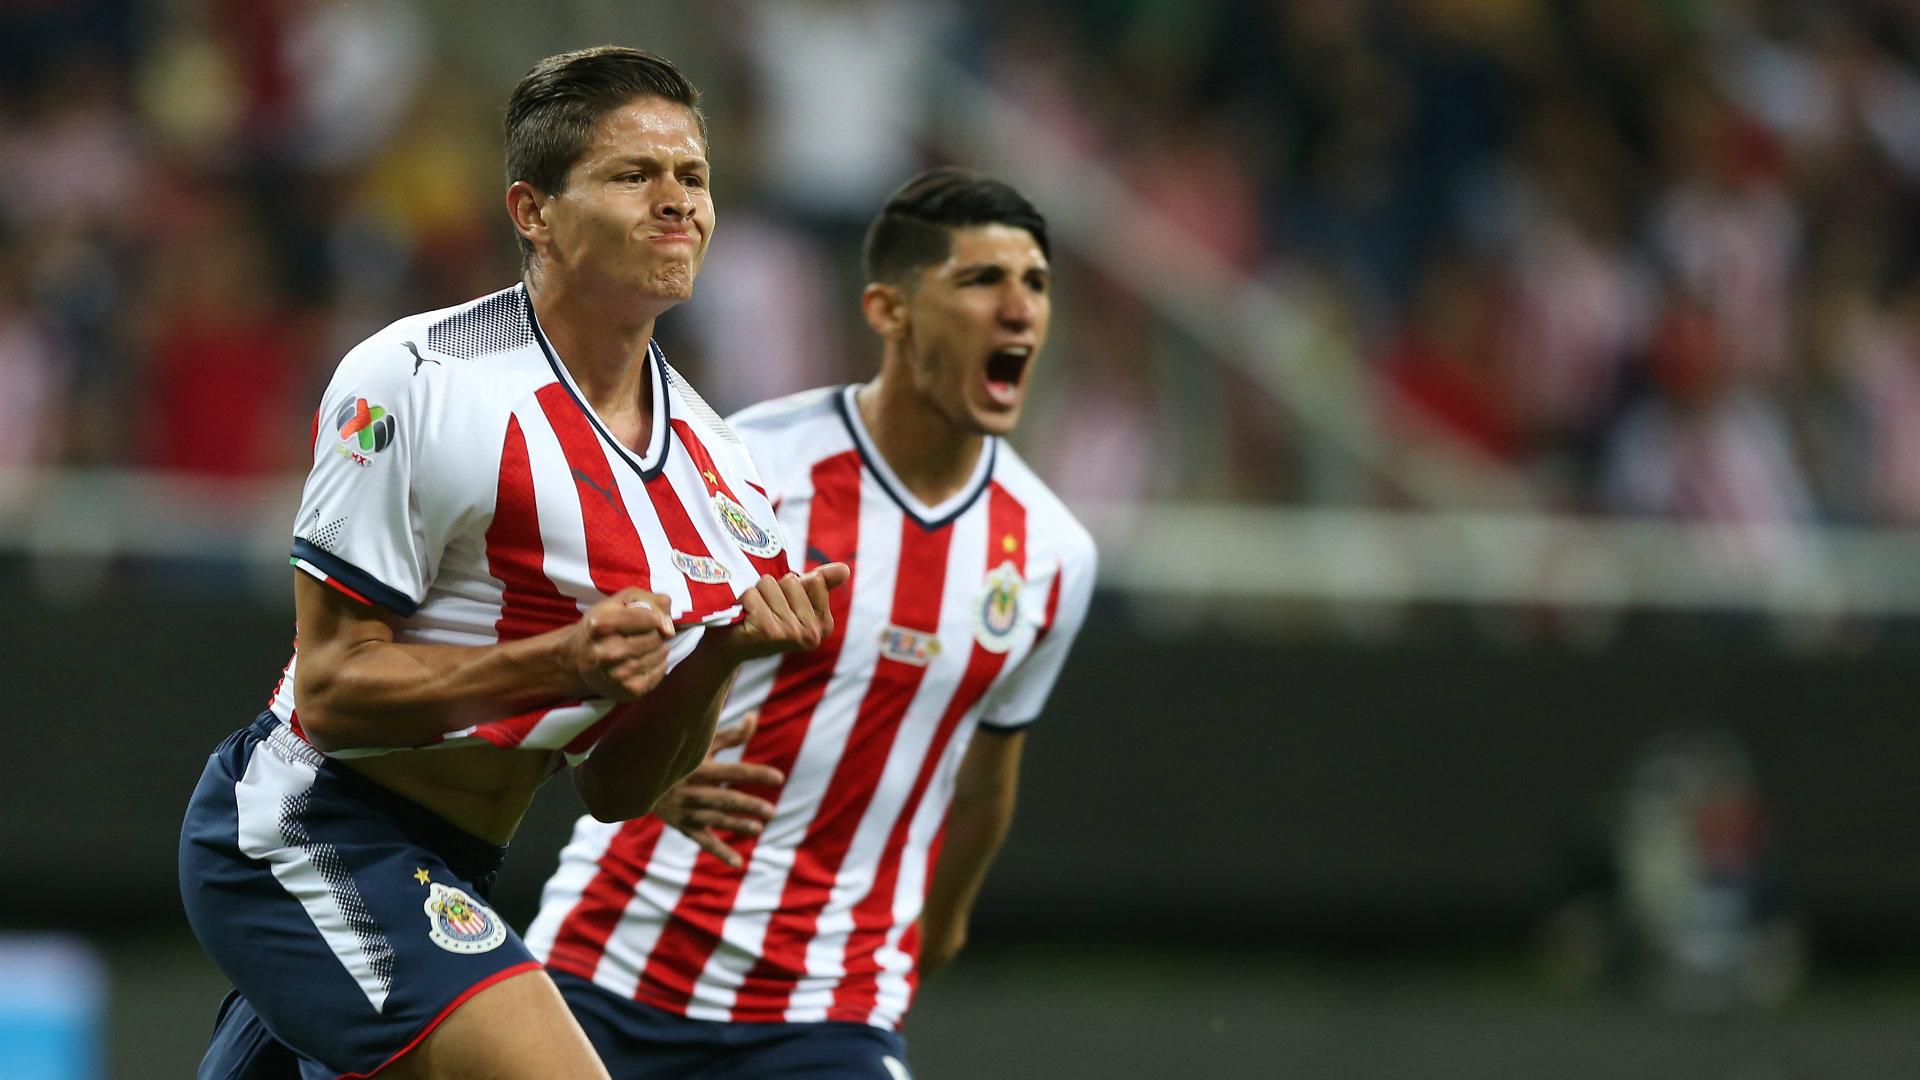 Jesús Godínez Chivas 2018 Liga MX